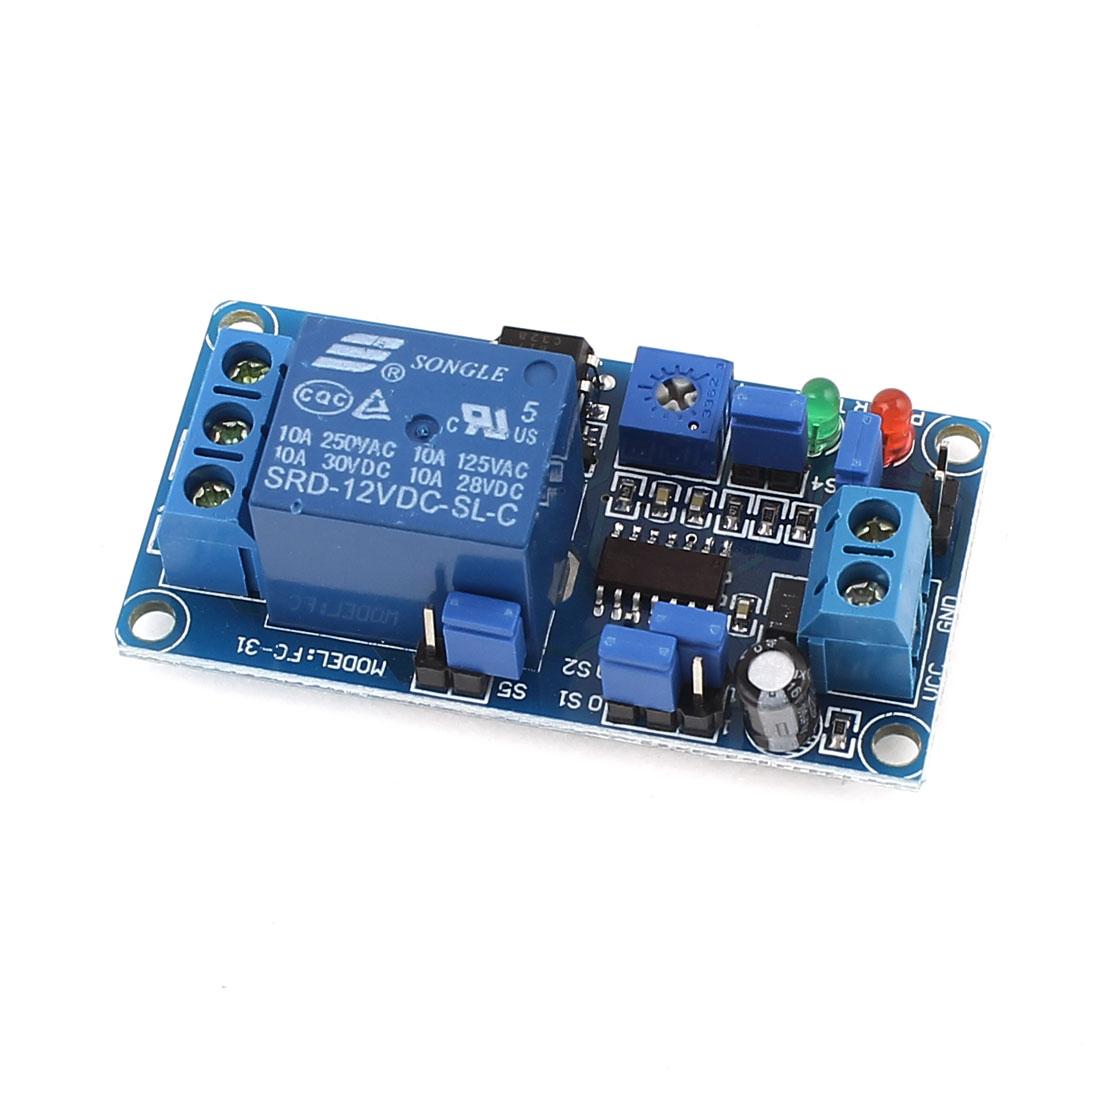 SRD-12VDC-SL-C 1 Channel High/Low Level Trigger Adjustable Delay Time Relay Module DC12V 10A